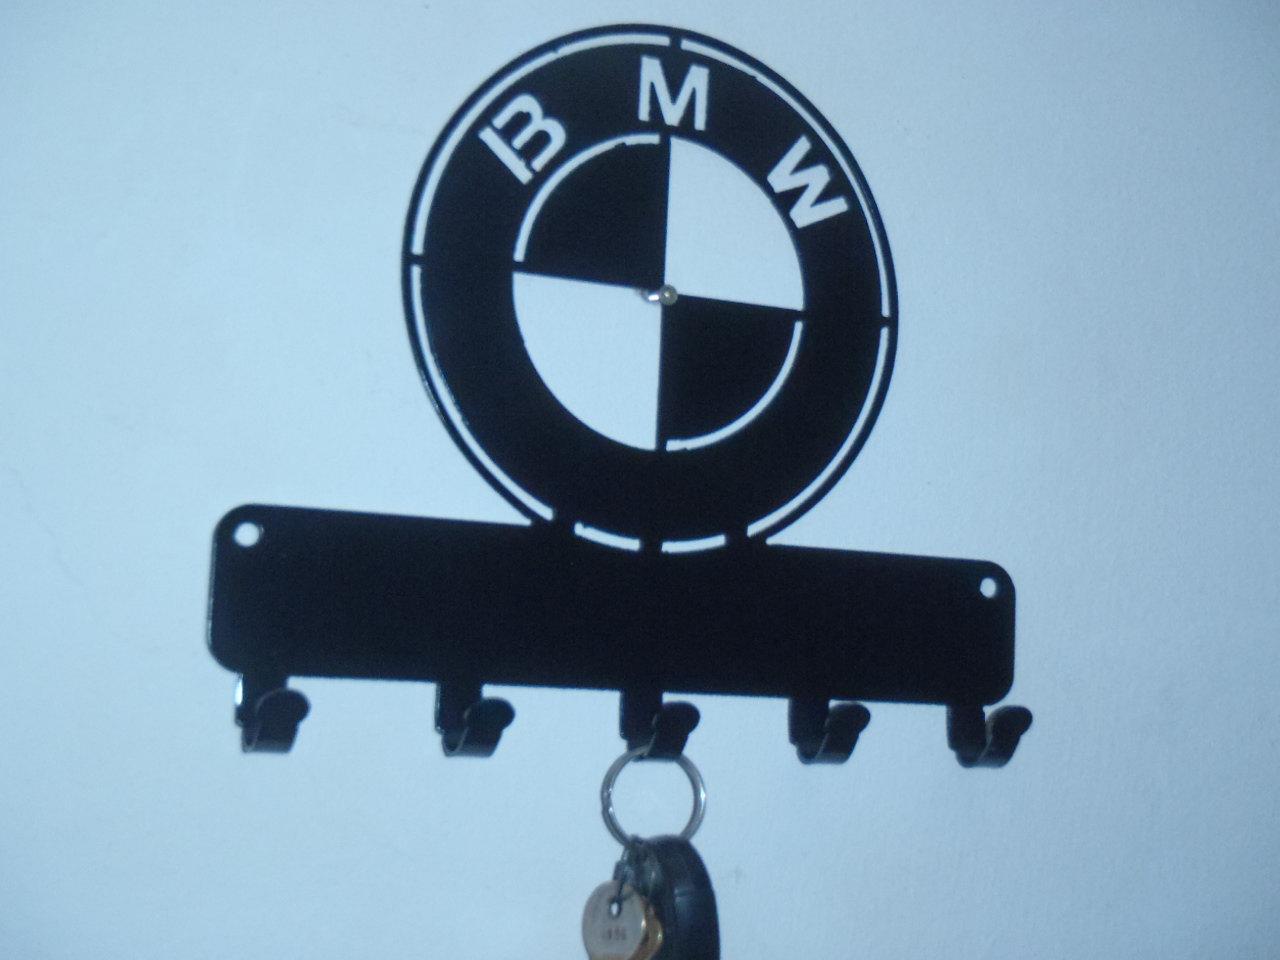 BMW Wall Hanger Plasma CNC Laser Cut Template Free Vector